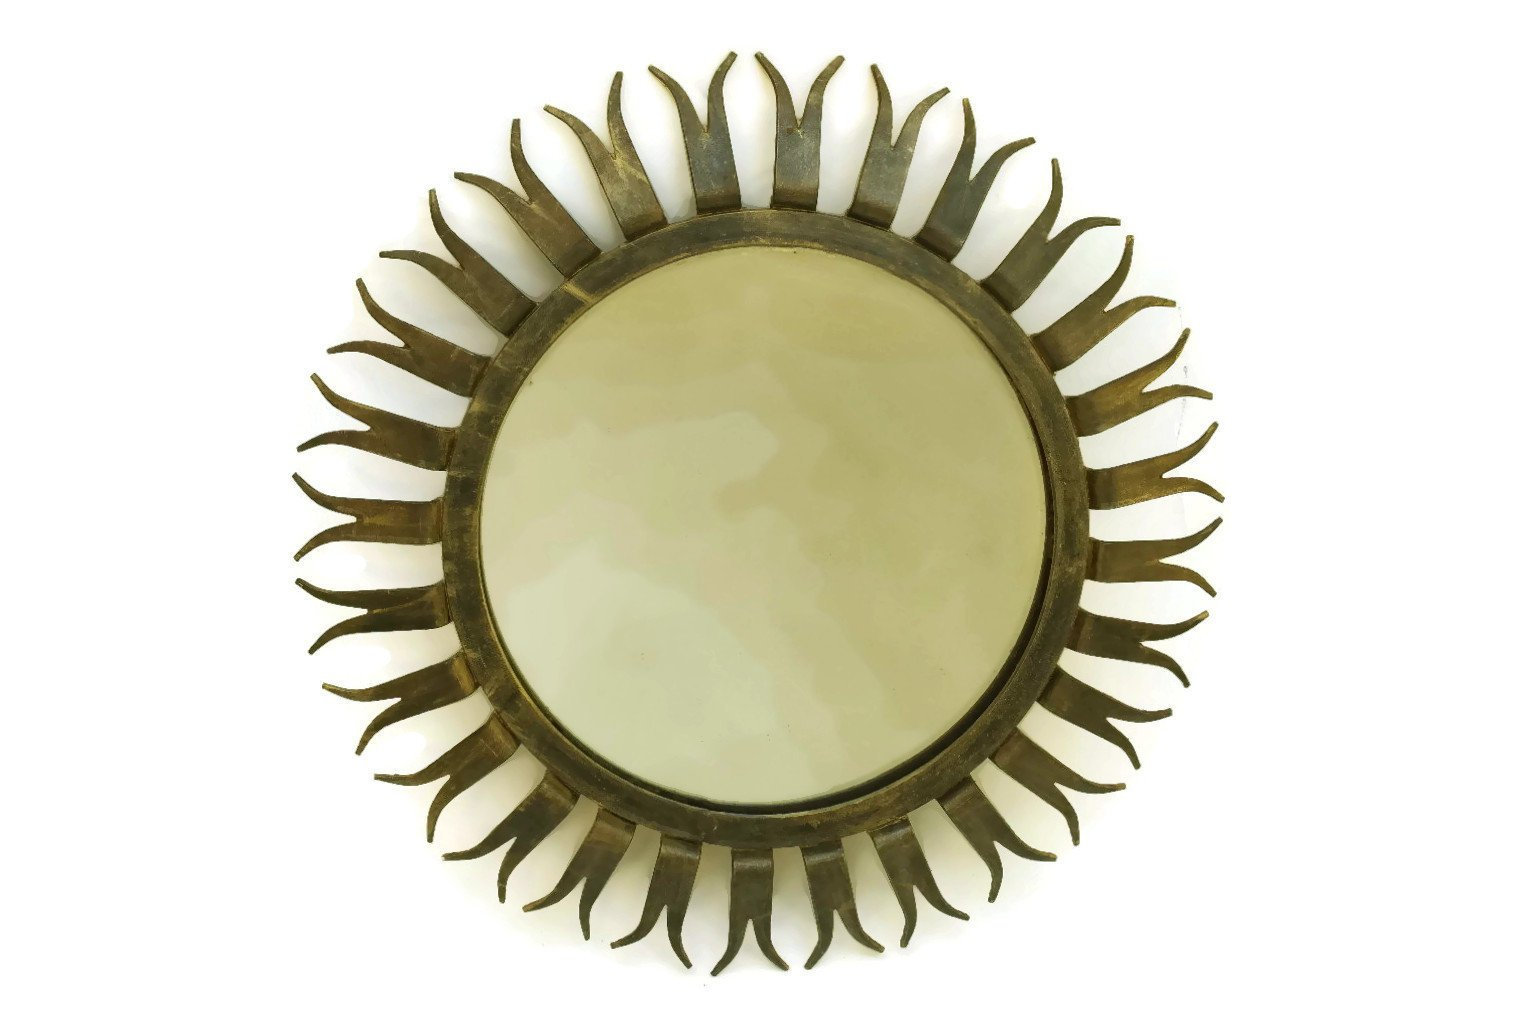 Vintage Sunburst Mirror with Round Black and Gold Metal Frame | Etsy